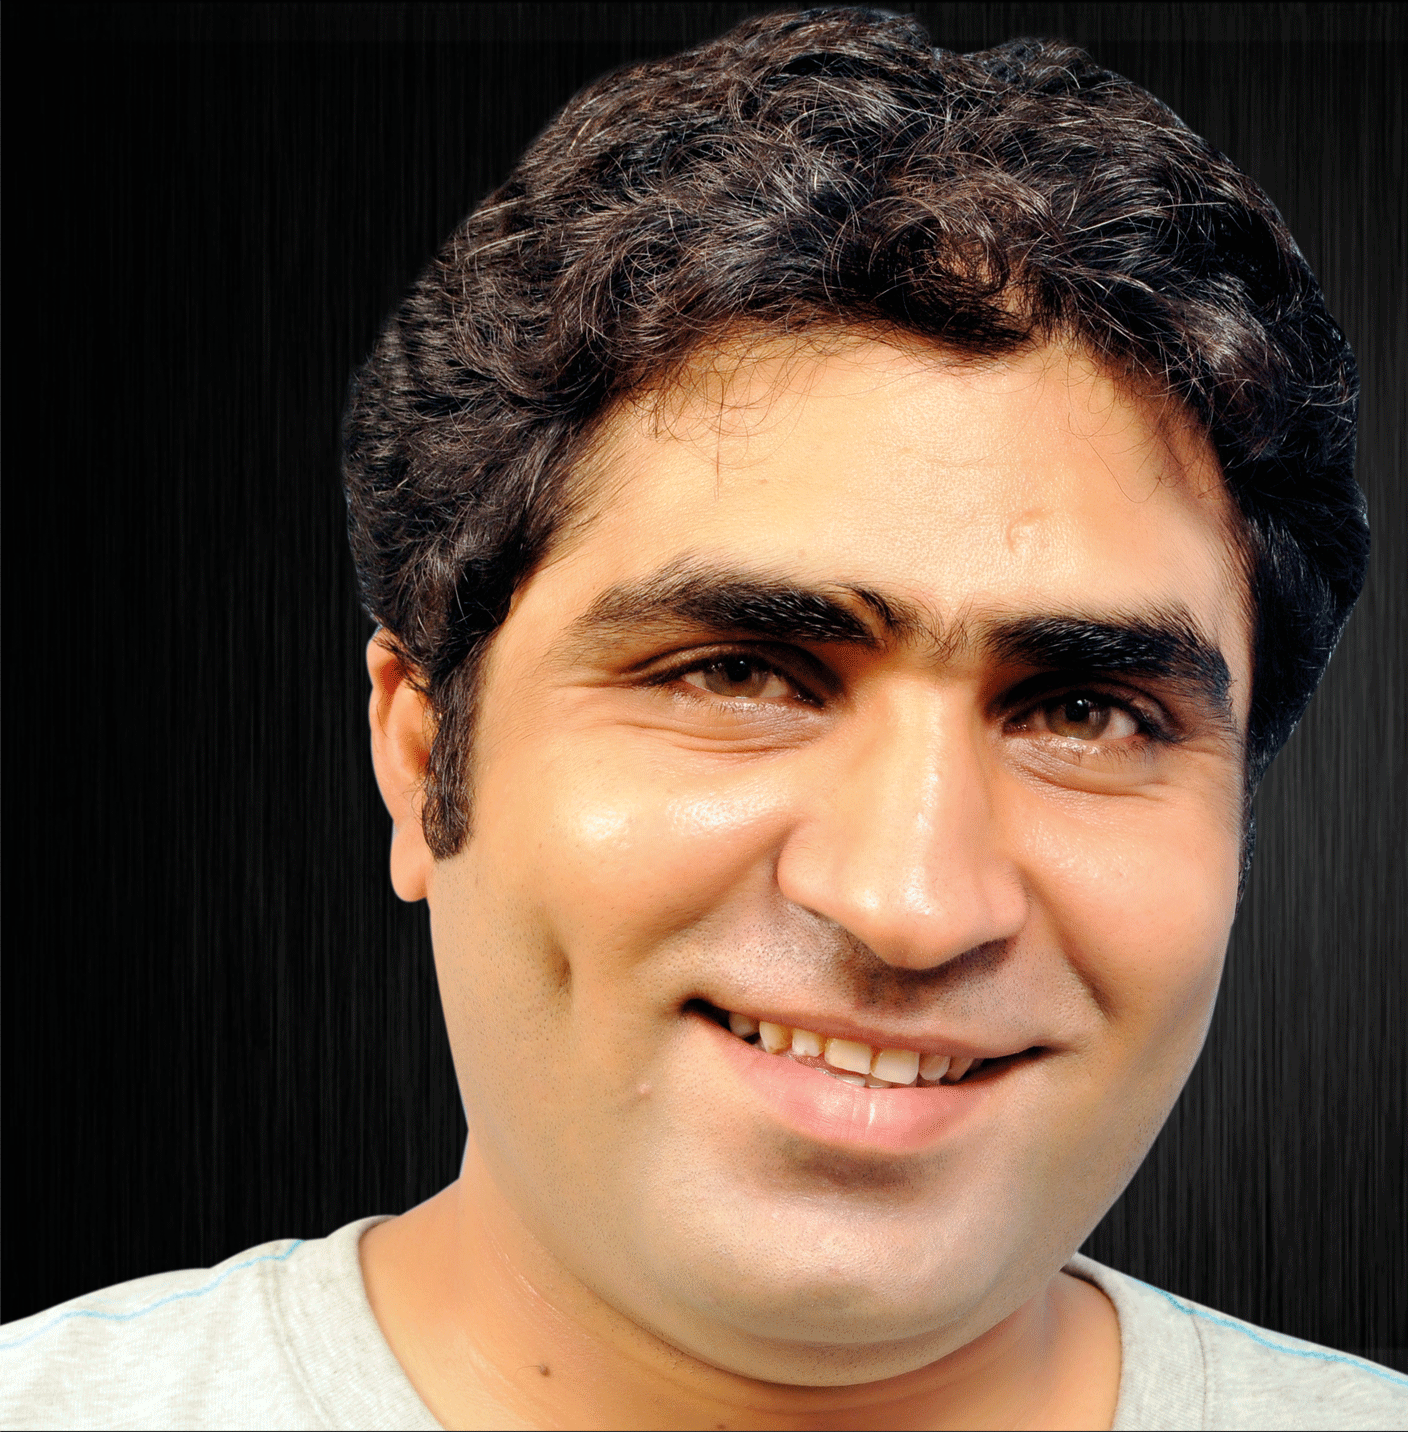 Tufail Shahzad